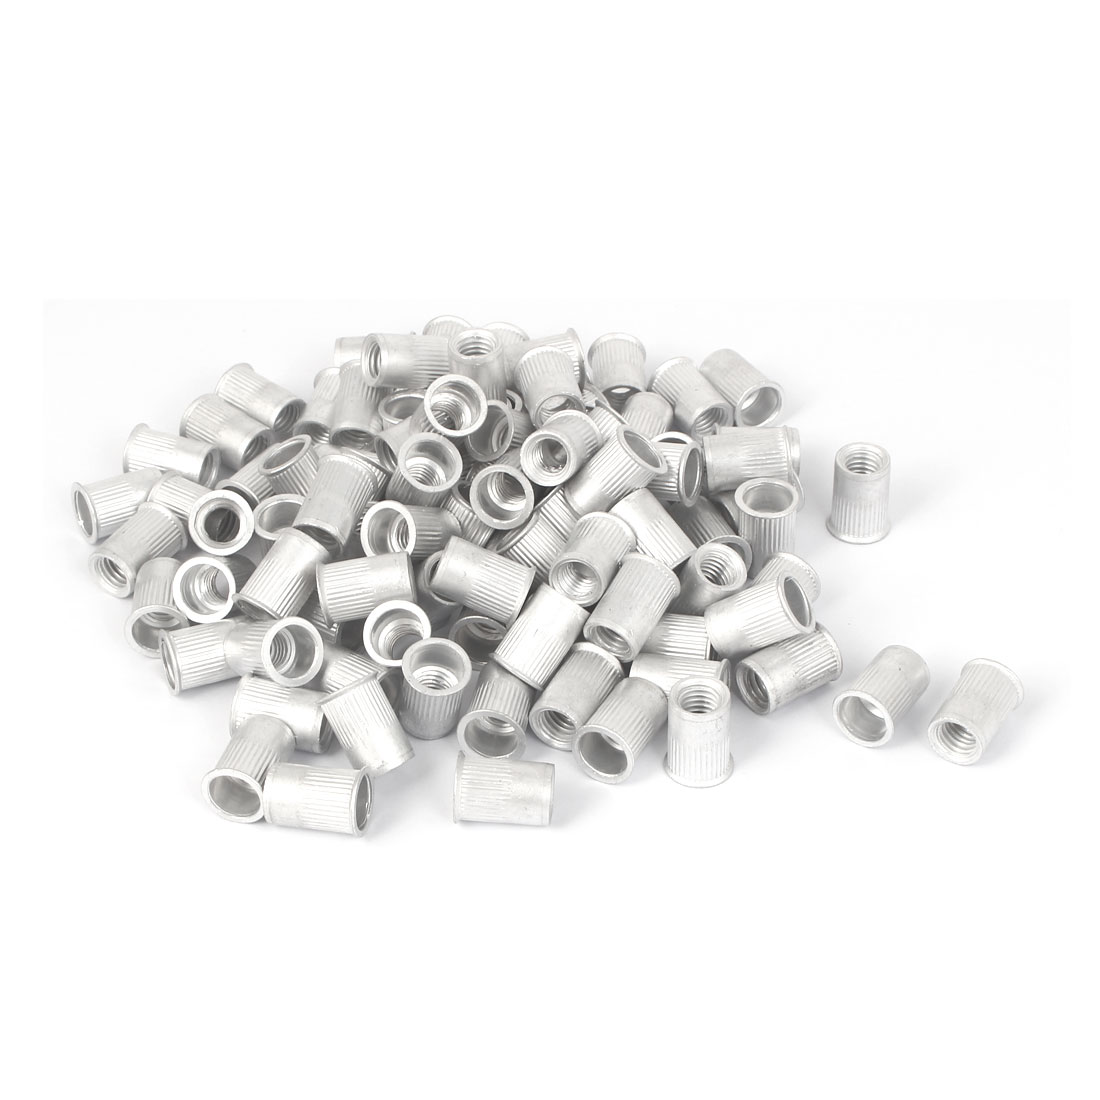 M8x16.5mm Aluminum Straight Knurled Reduced Head Blind Rivet Nut 100pcs